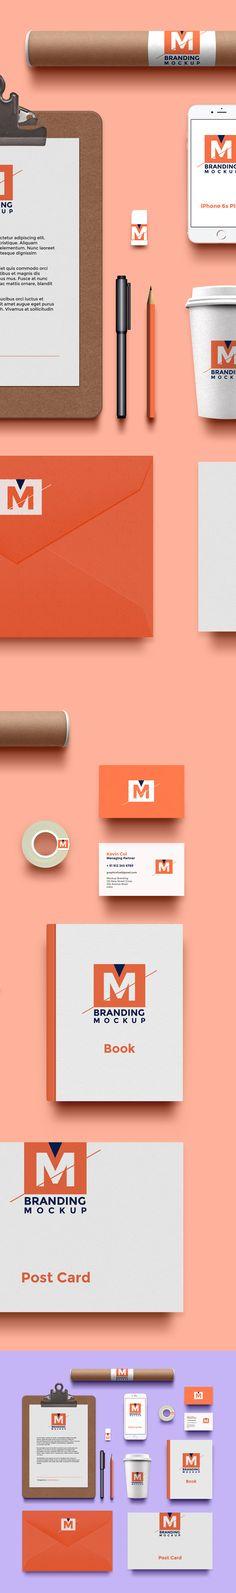 Branding Identidad maqueta PSD